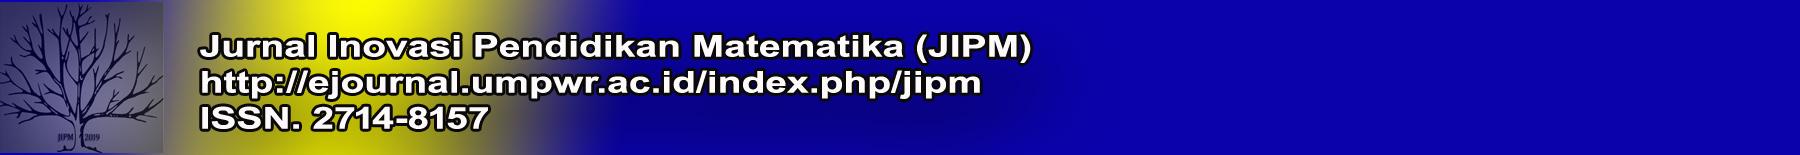 Jurnal Inovasi Pendidikan Matematika [JIPM]